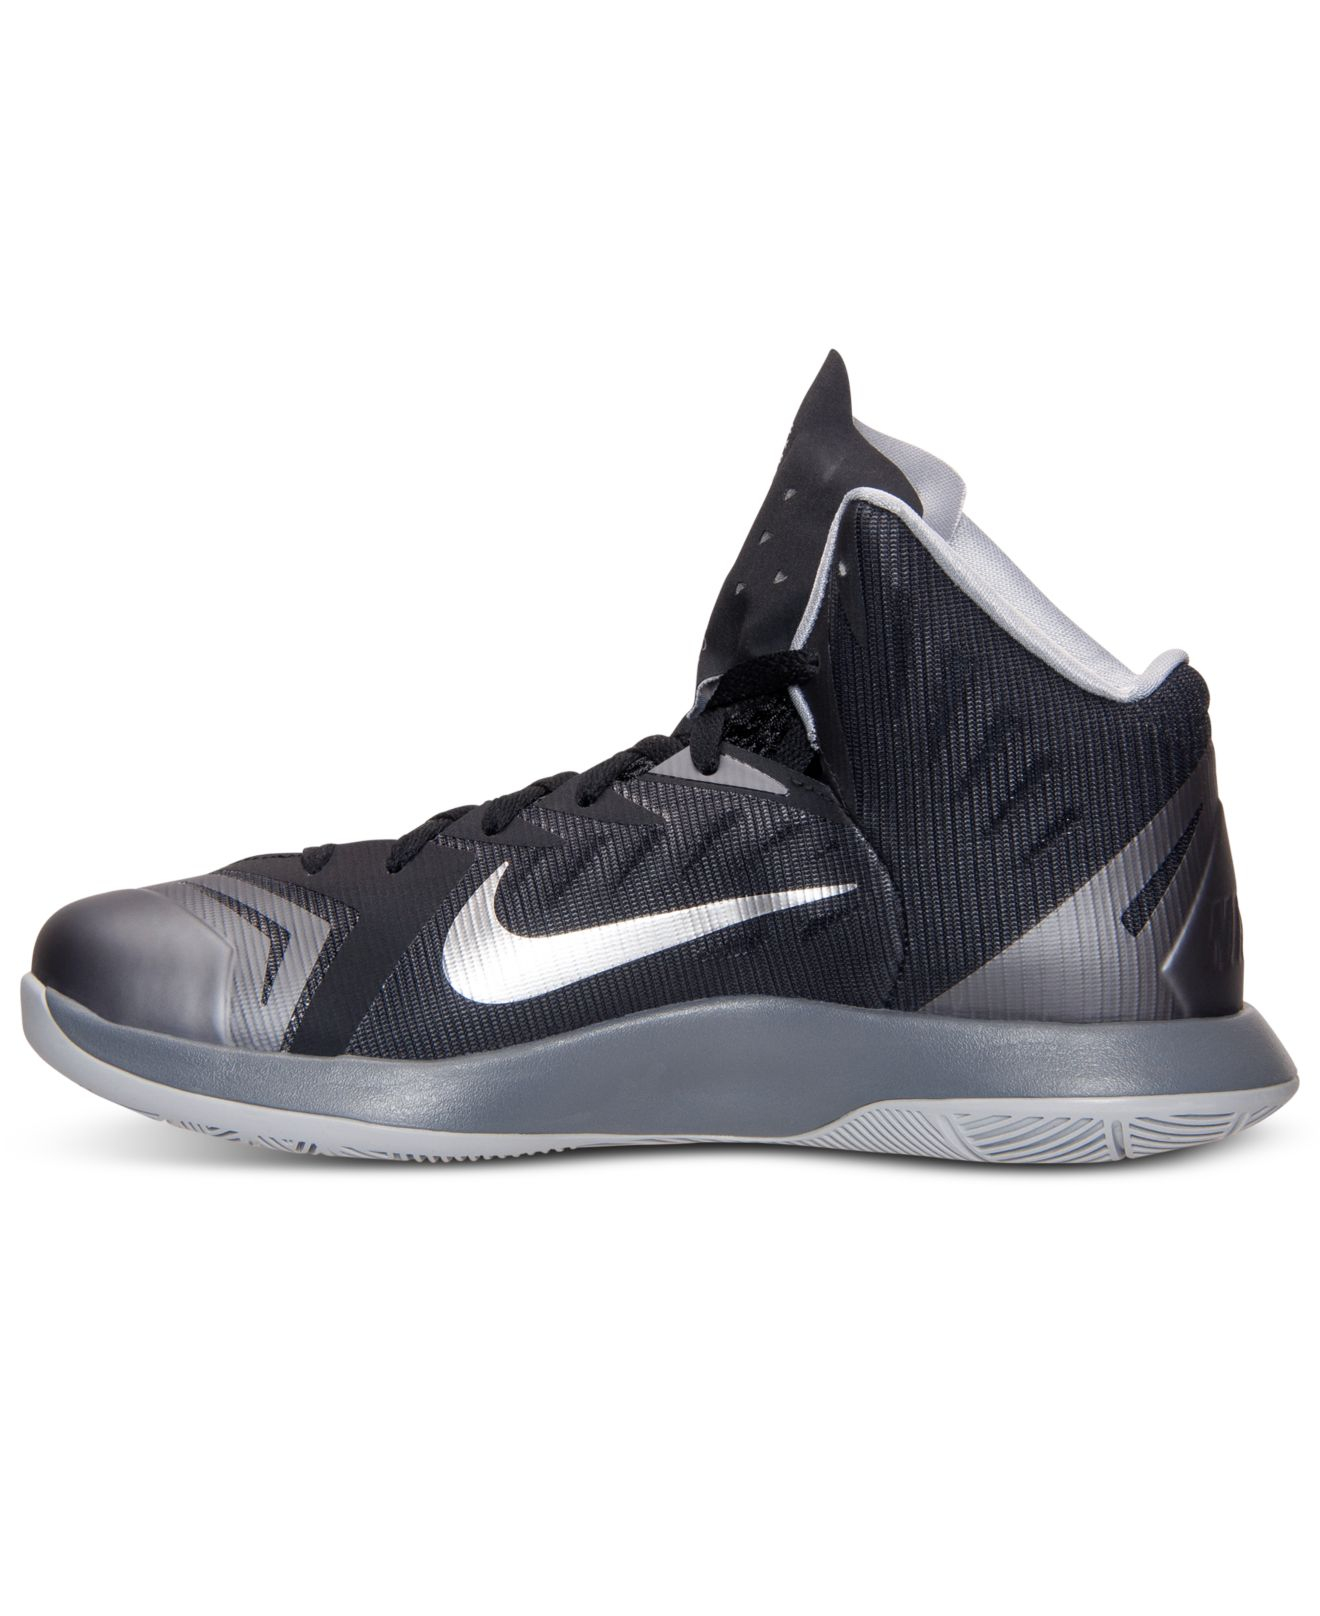 nike air force 1 07 high lv8 men's shoe 0 minus 30% hydrogen